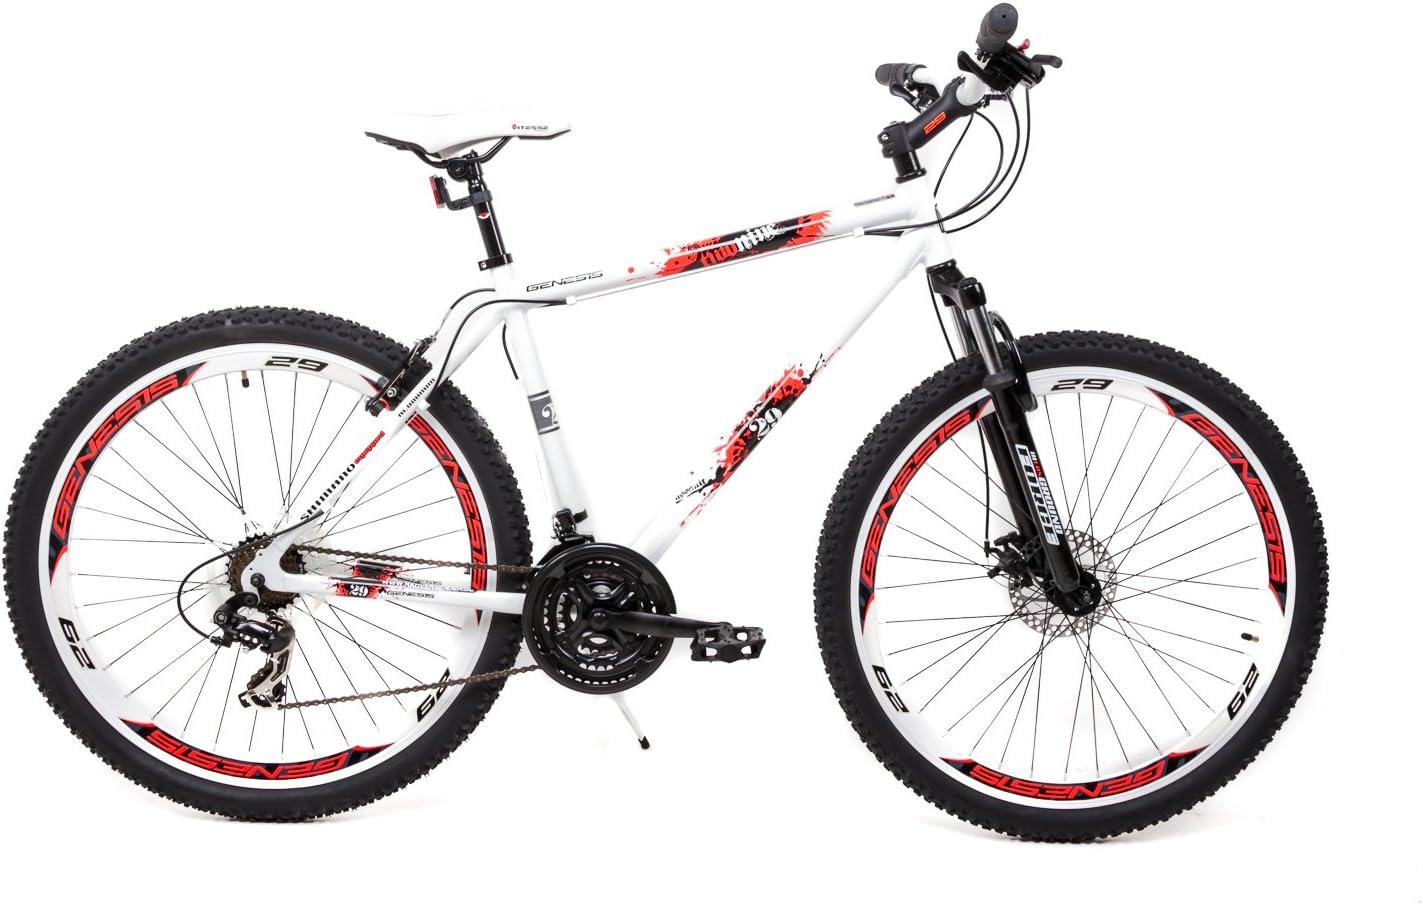 29 Pulgadas Aluminio Cross Bicicleta de montaña Genesis 21 ...